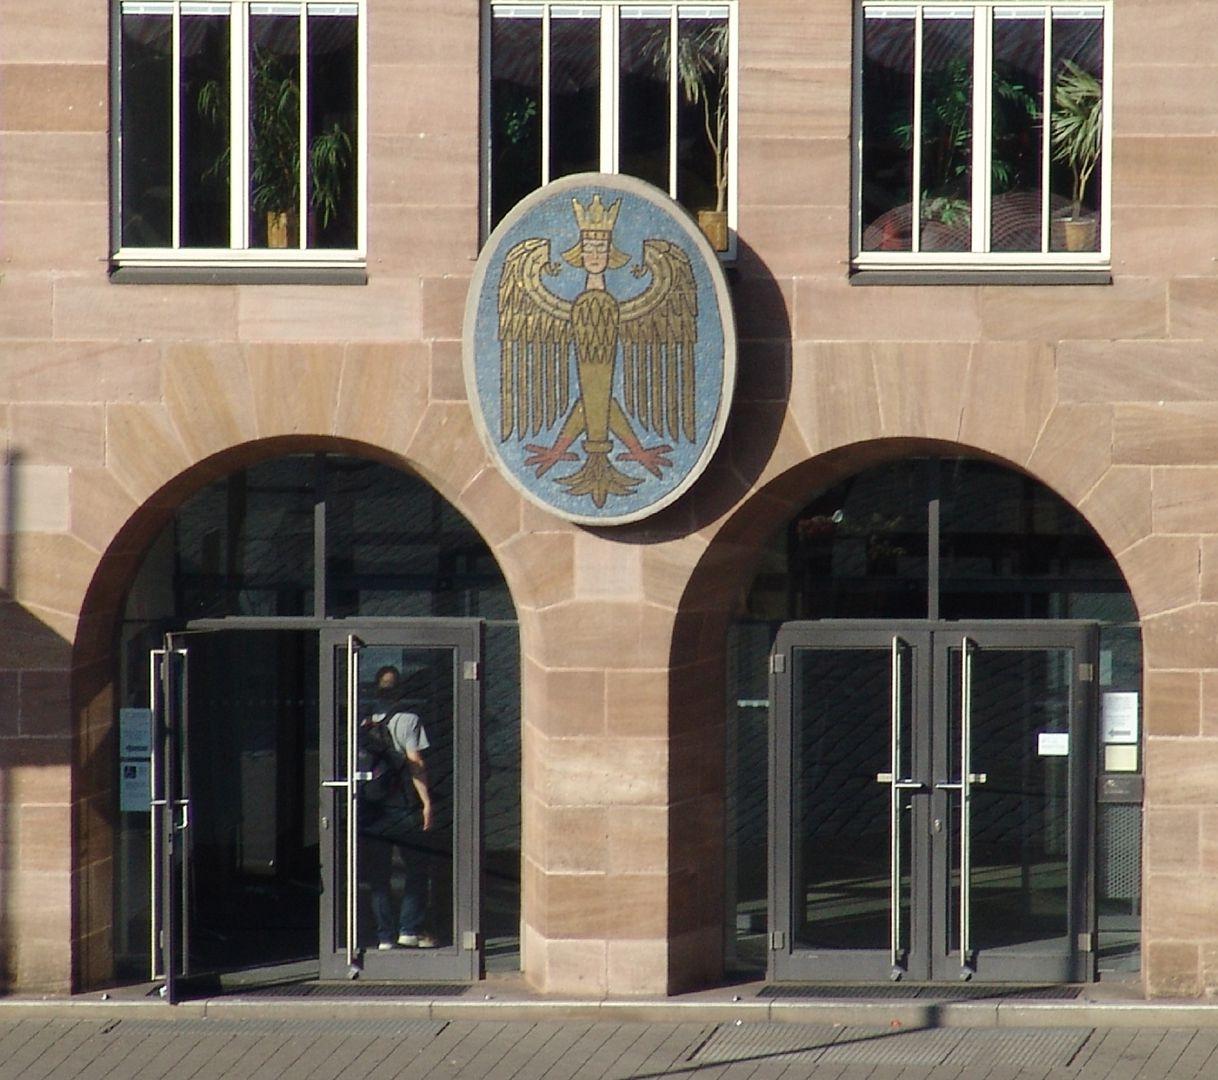 New City Hall at Hauptmarkt (Main Market) South front, twin portal